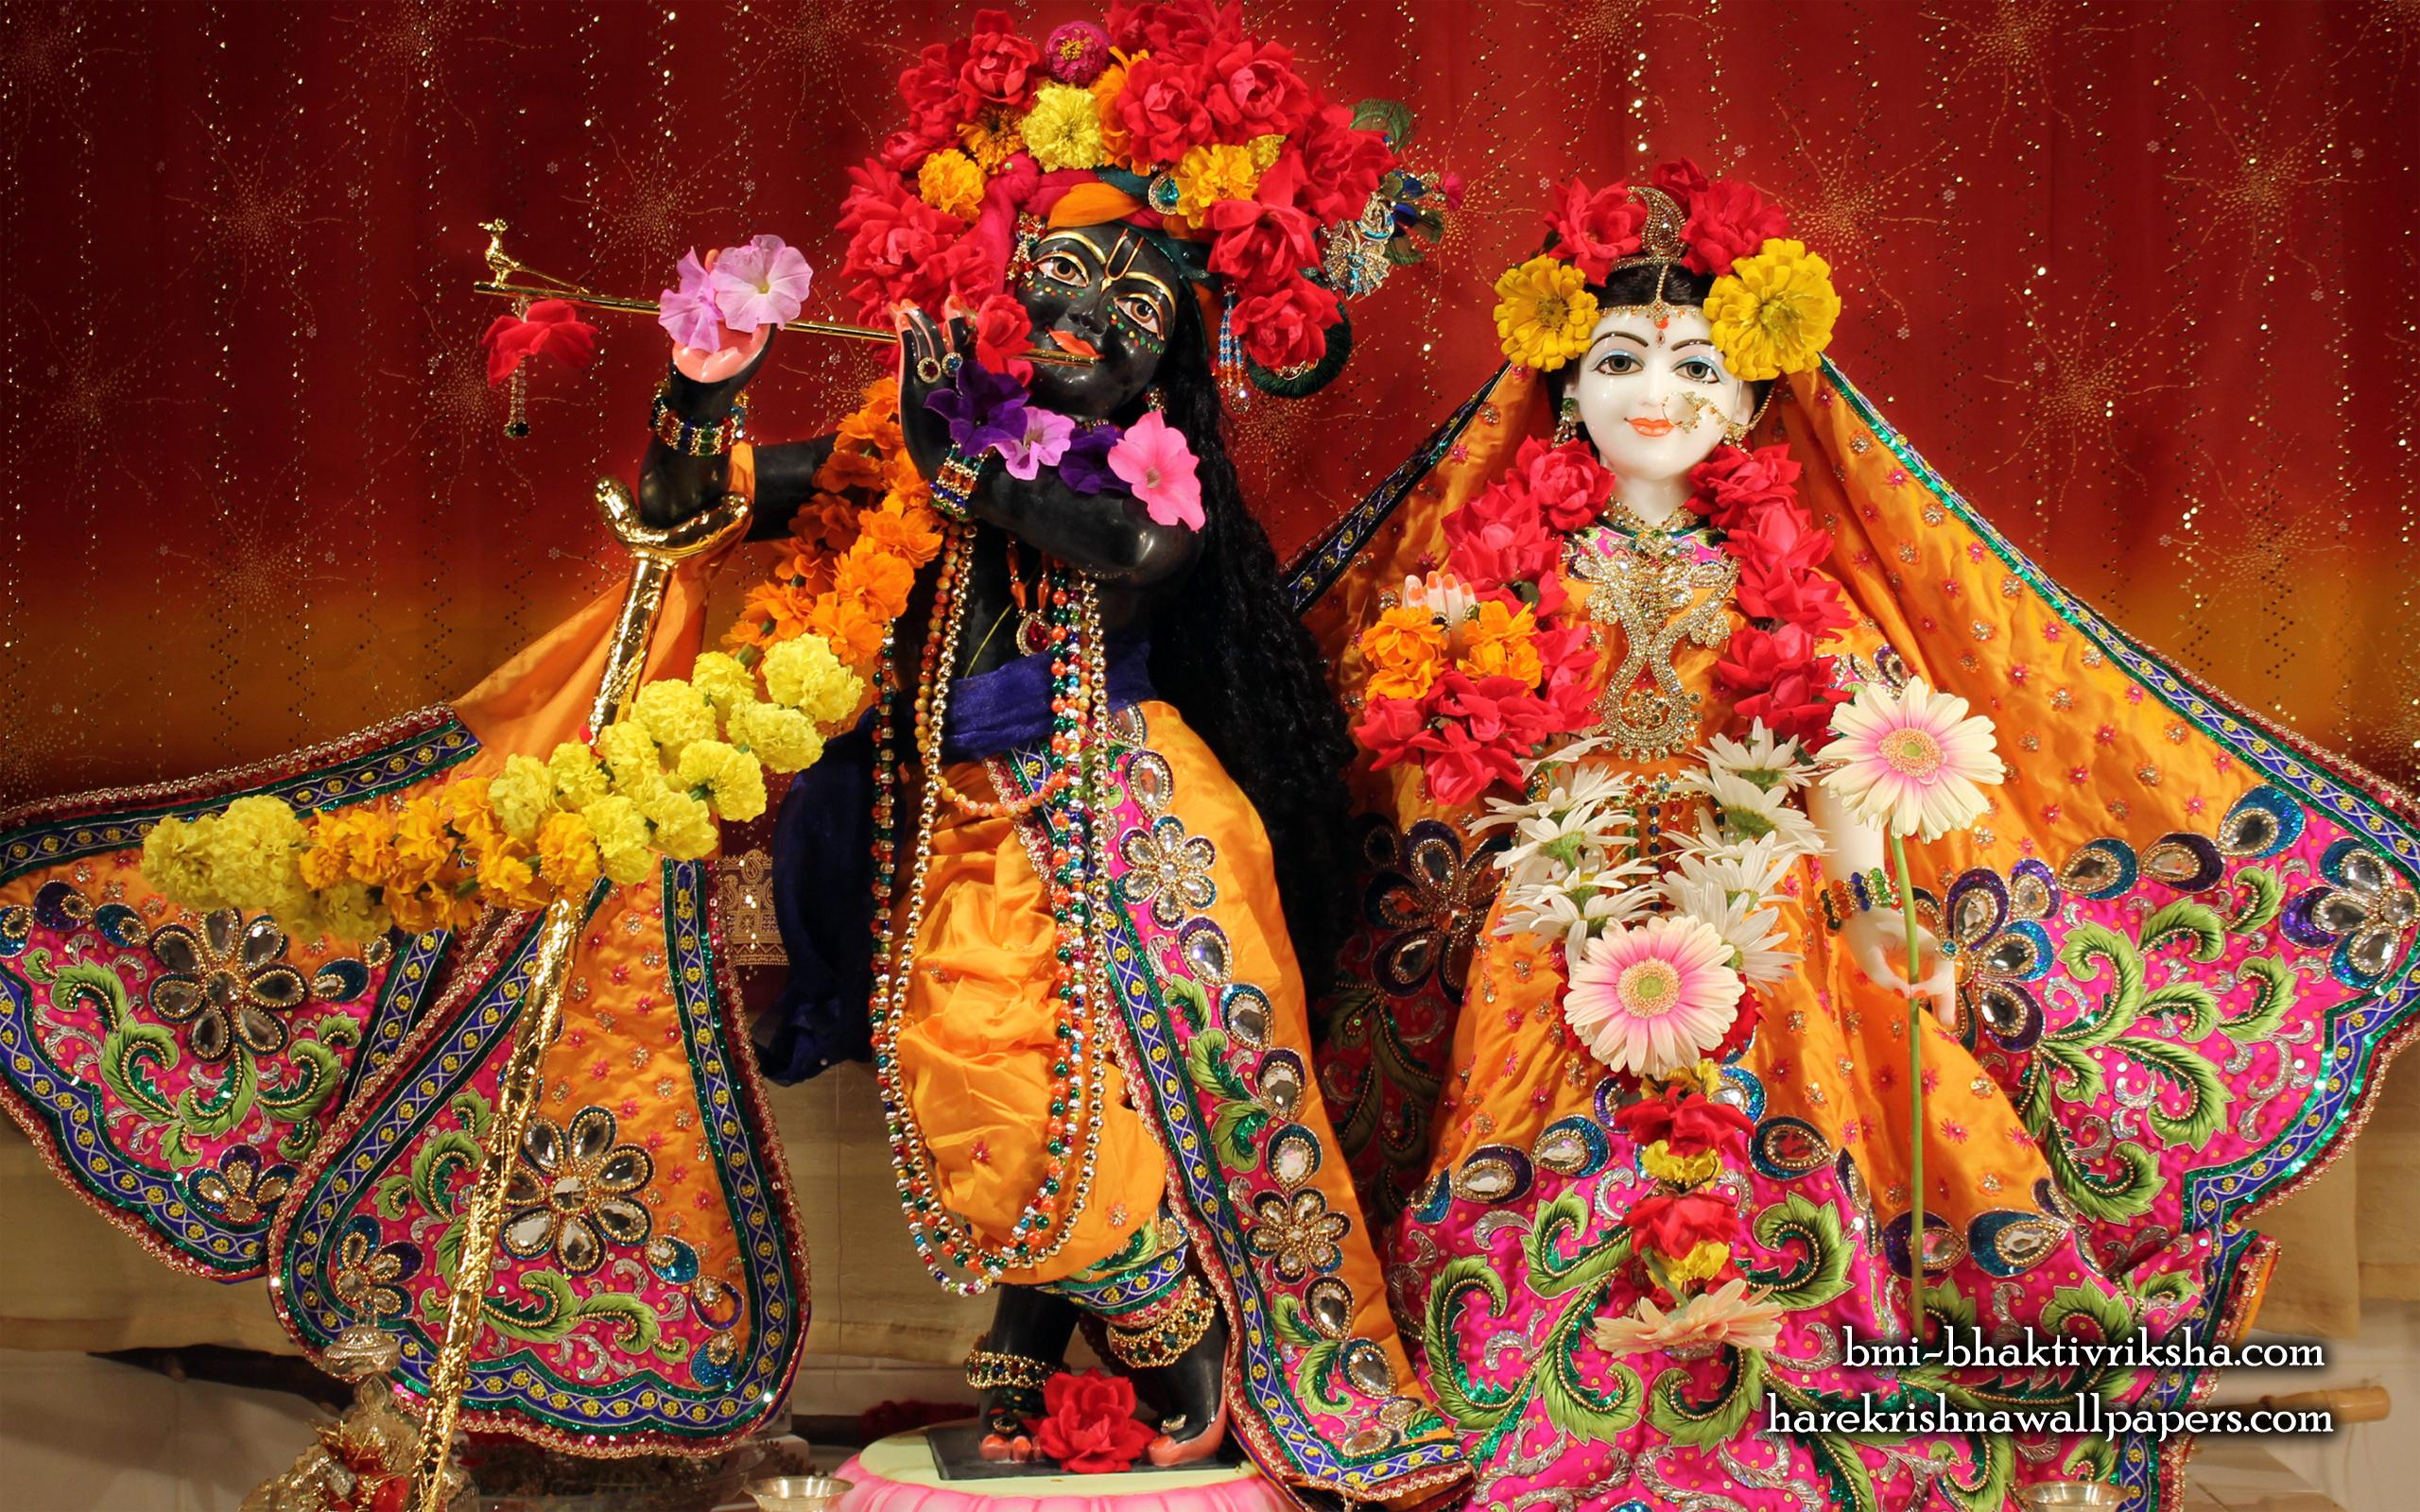 Sri Sri Radha Shyamsundar Wallpaper (001) Size 2560x1600 Download